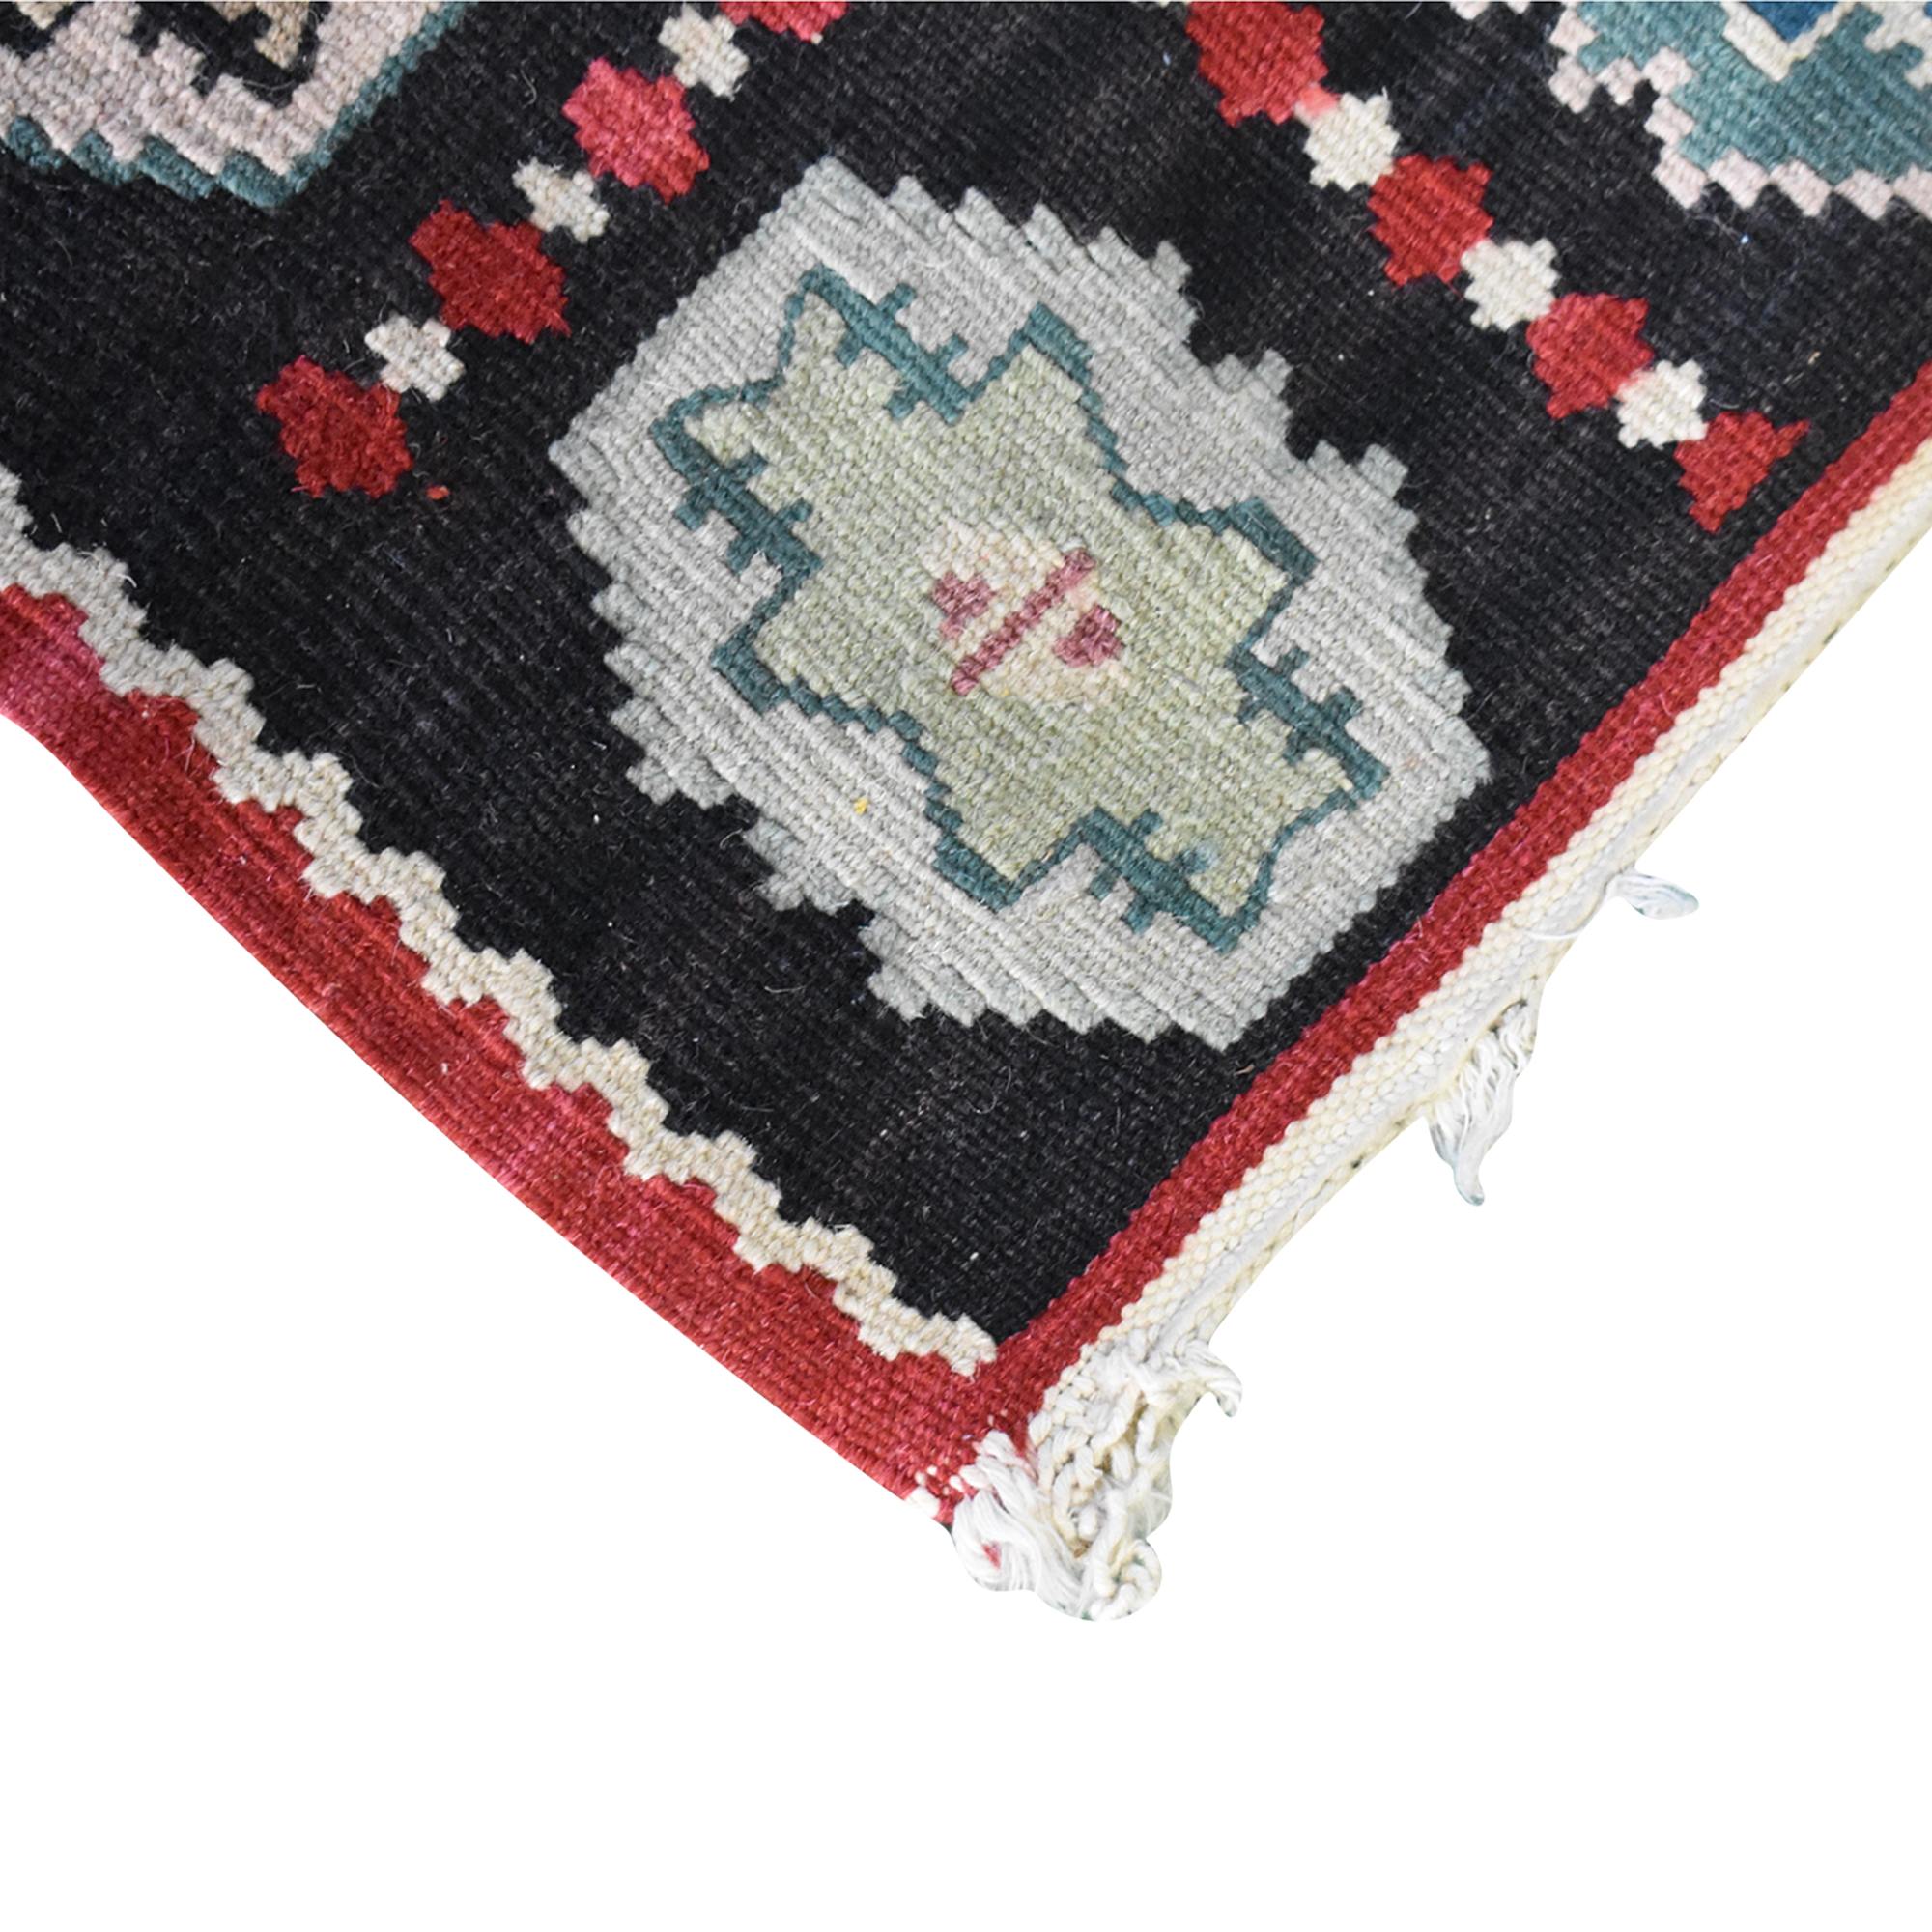 ABC Carpet & Home Turkish Kilim Area Rug sale